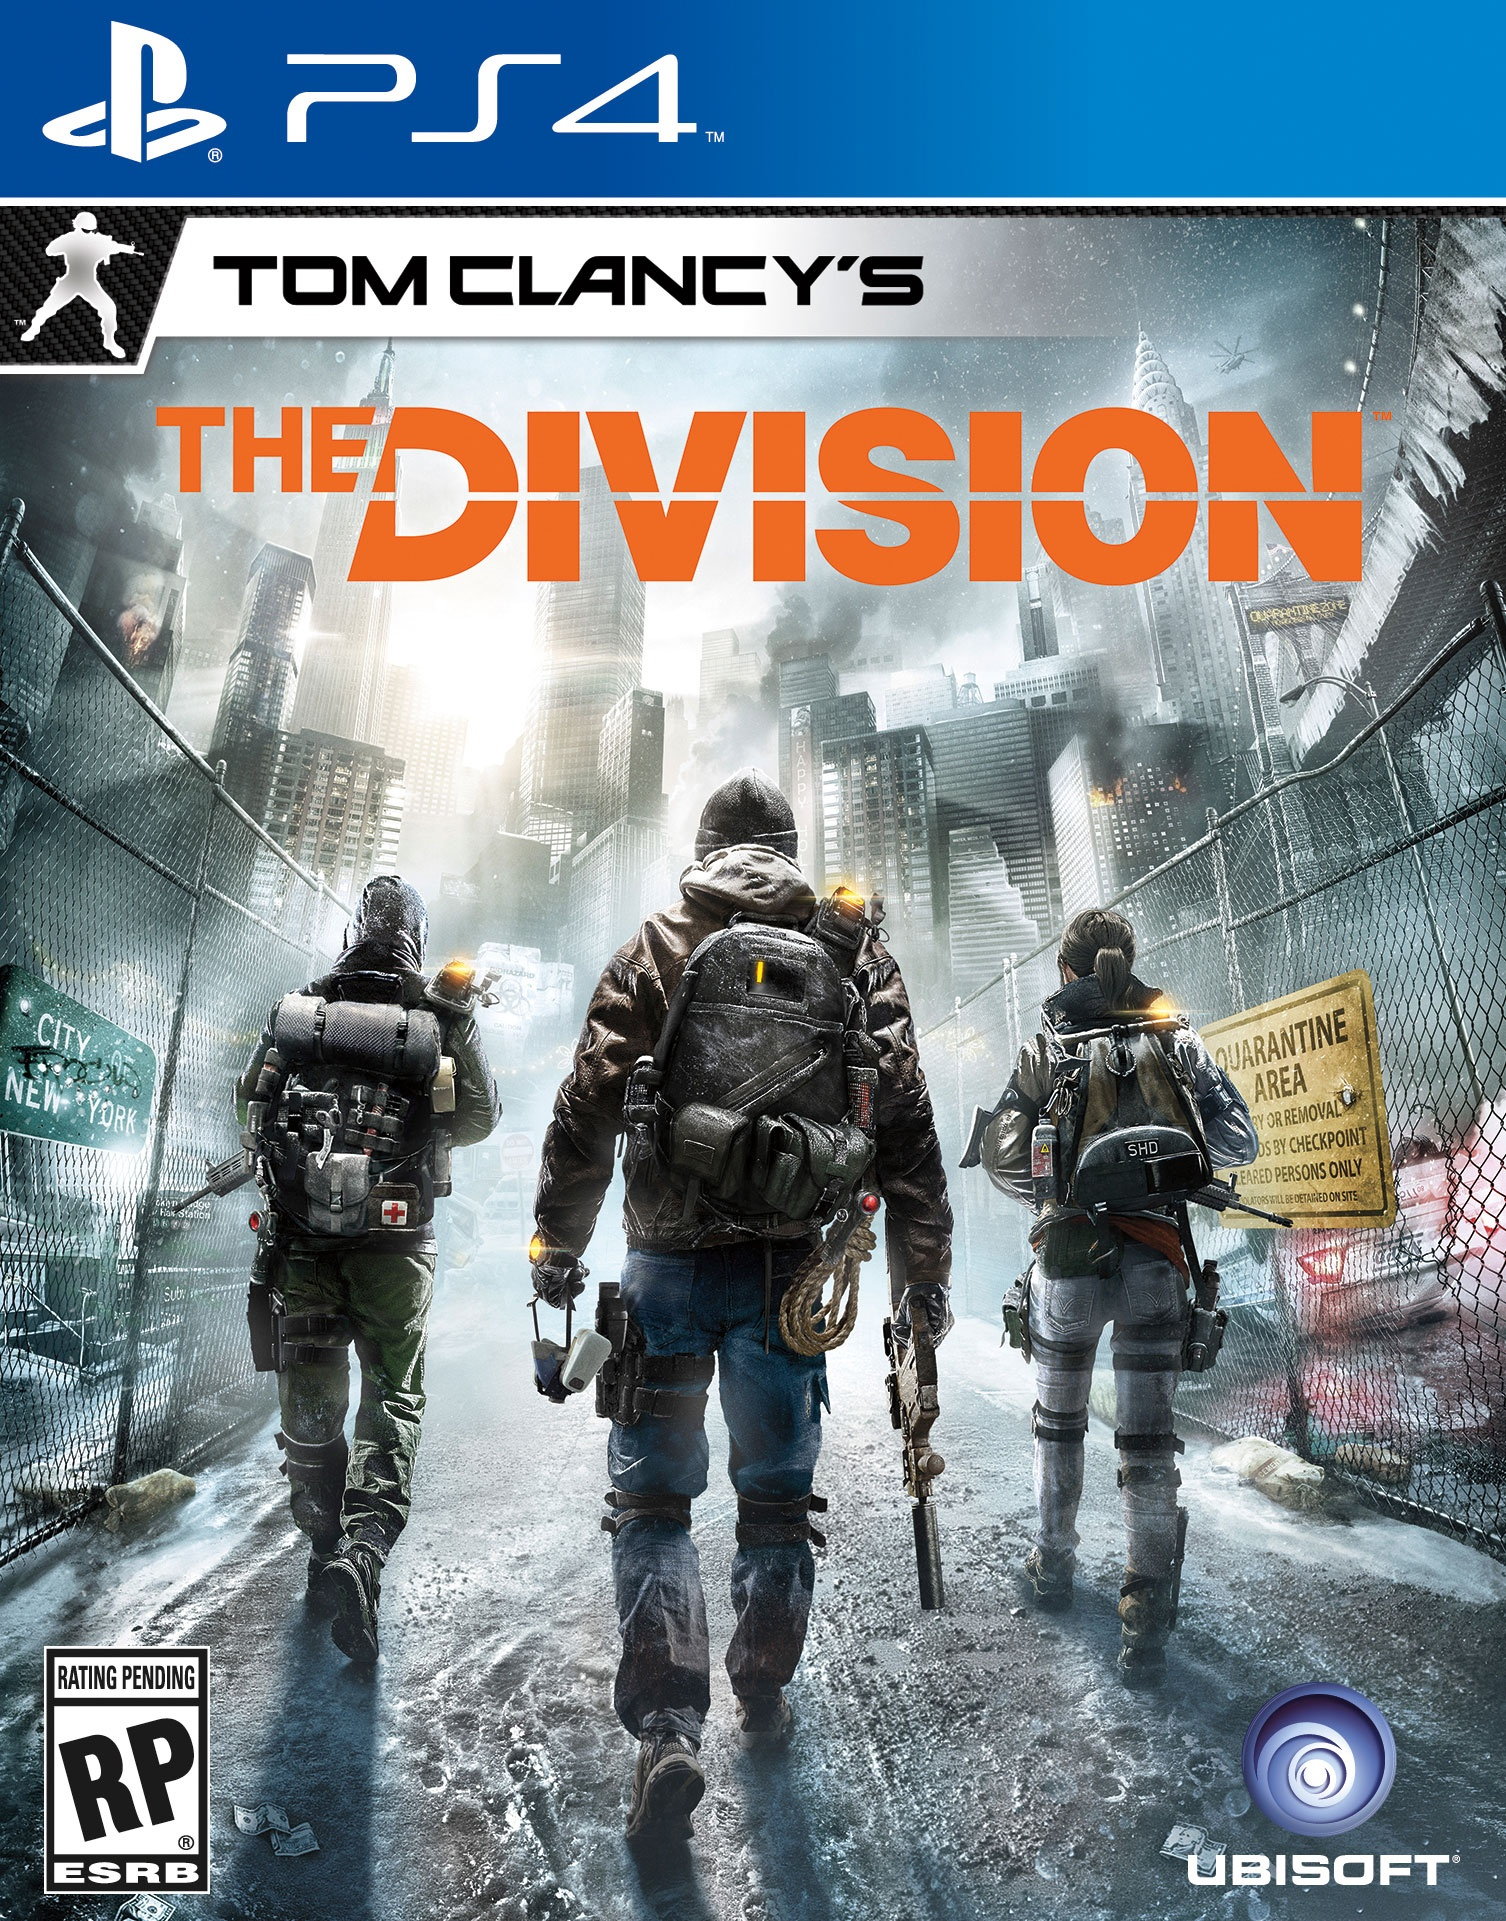 Très Tom Clancy's The Division sur PlayStation 4 - jeuxvideo.com TO33